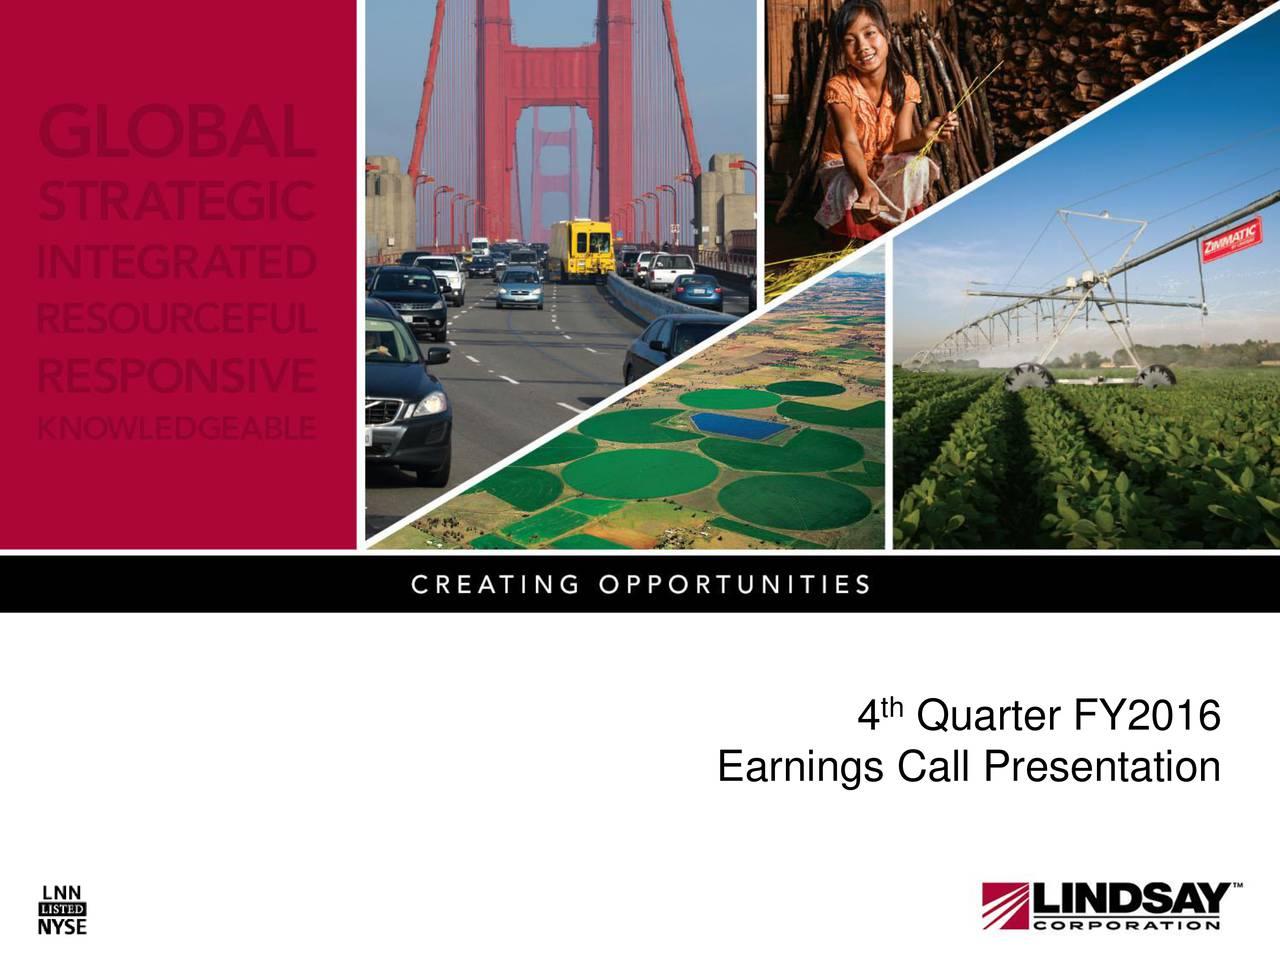 Earnings Call Presentation 4 Quarter FY2016 Earnings Call Presentat1on